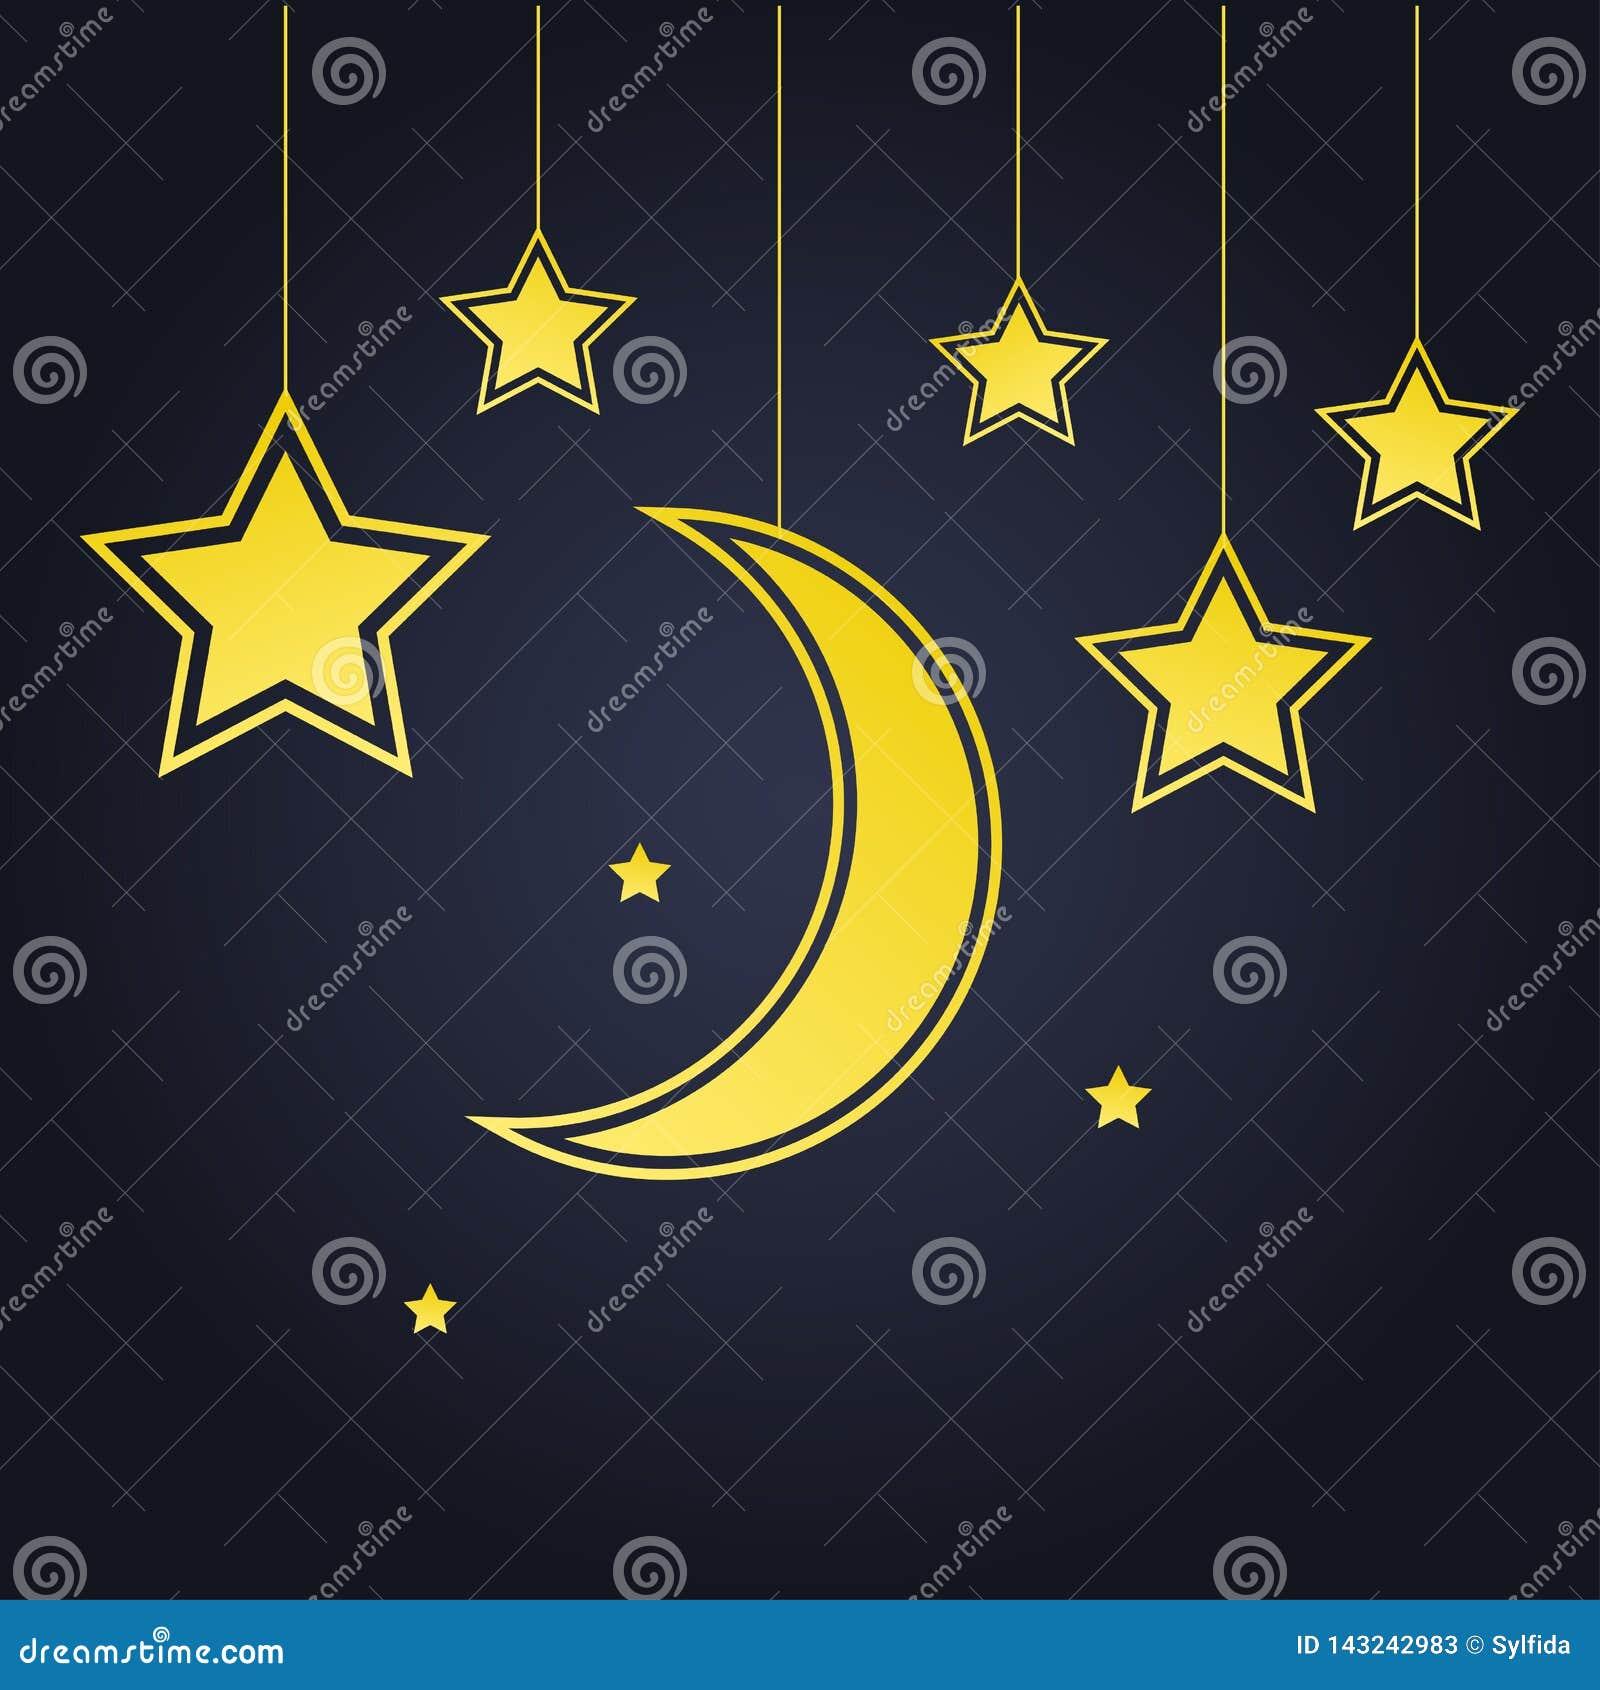 Golden moon and stars. Vector illustration